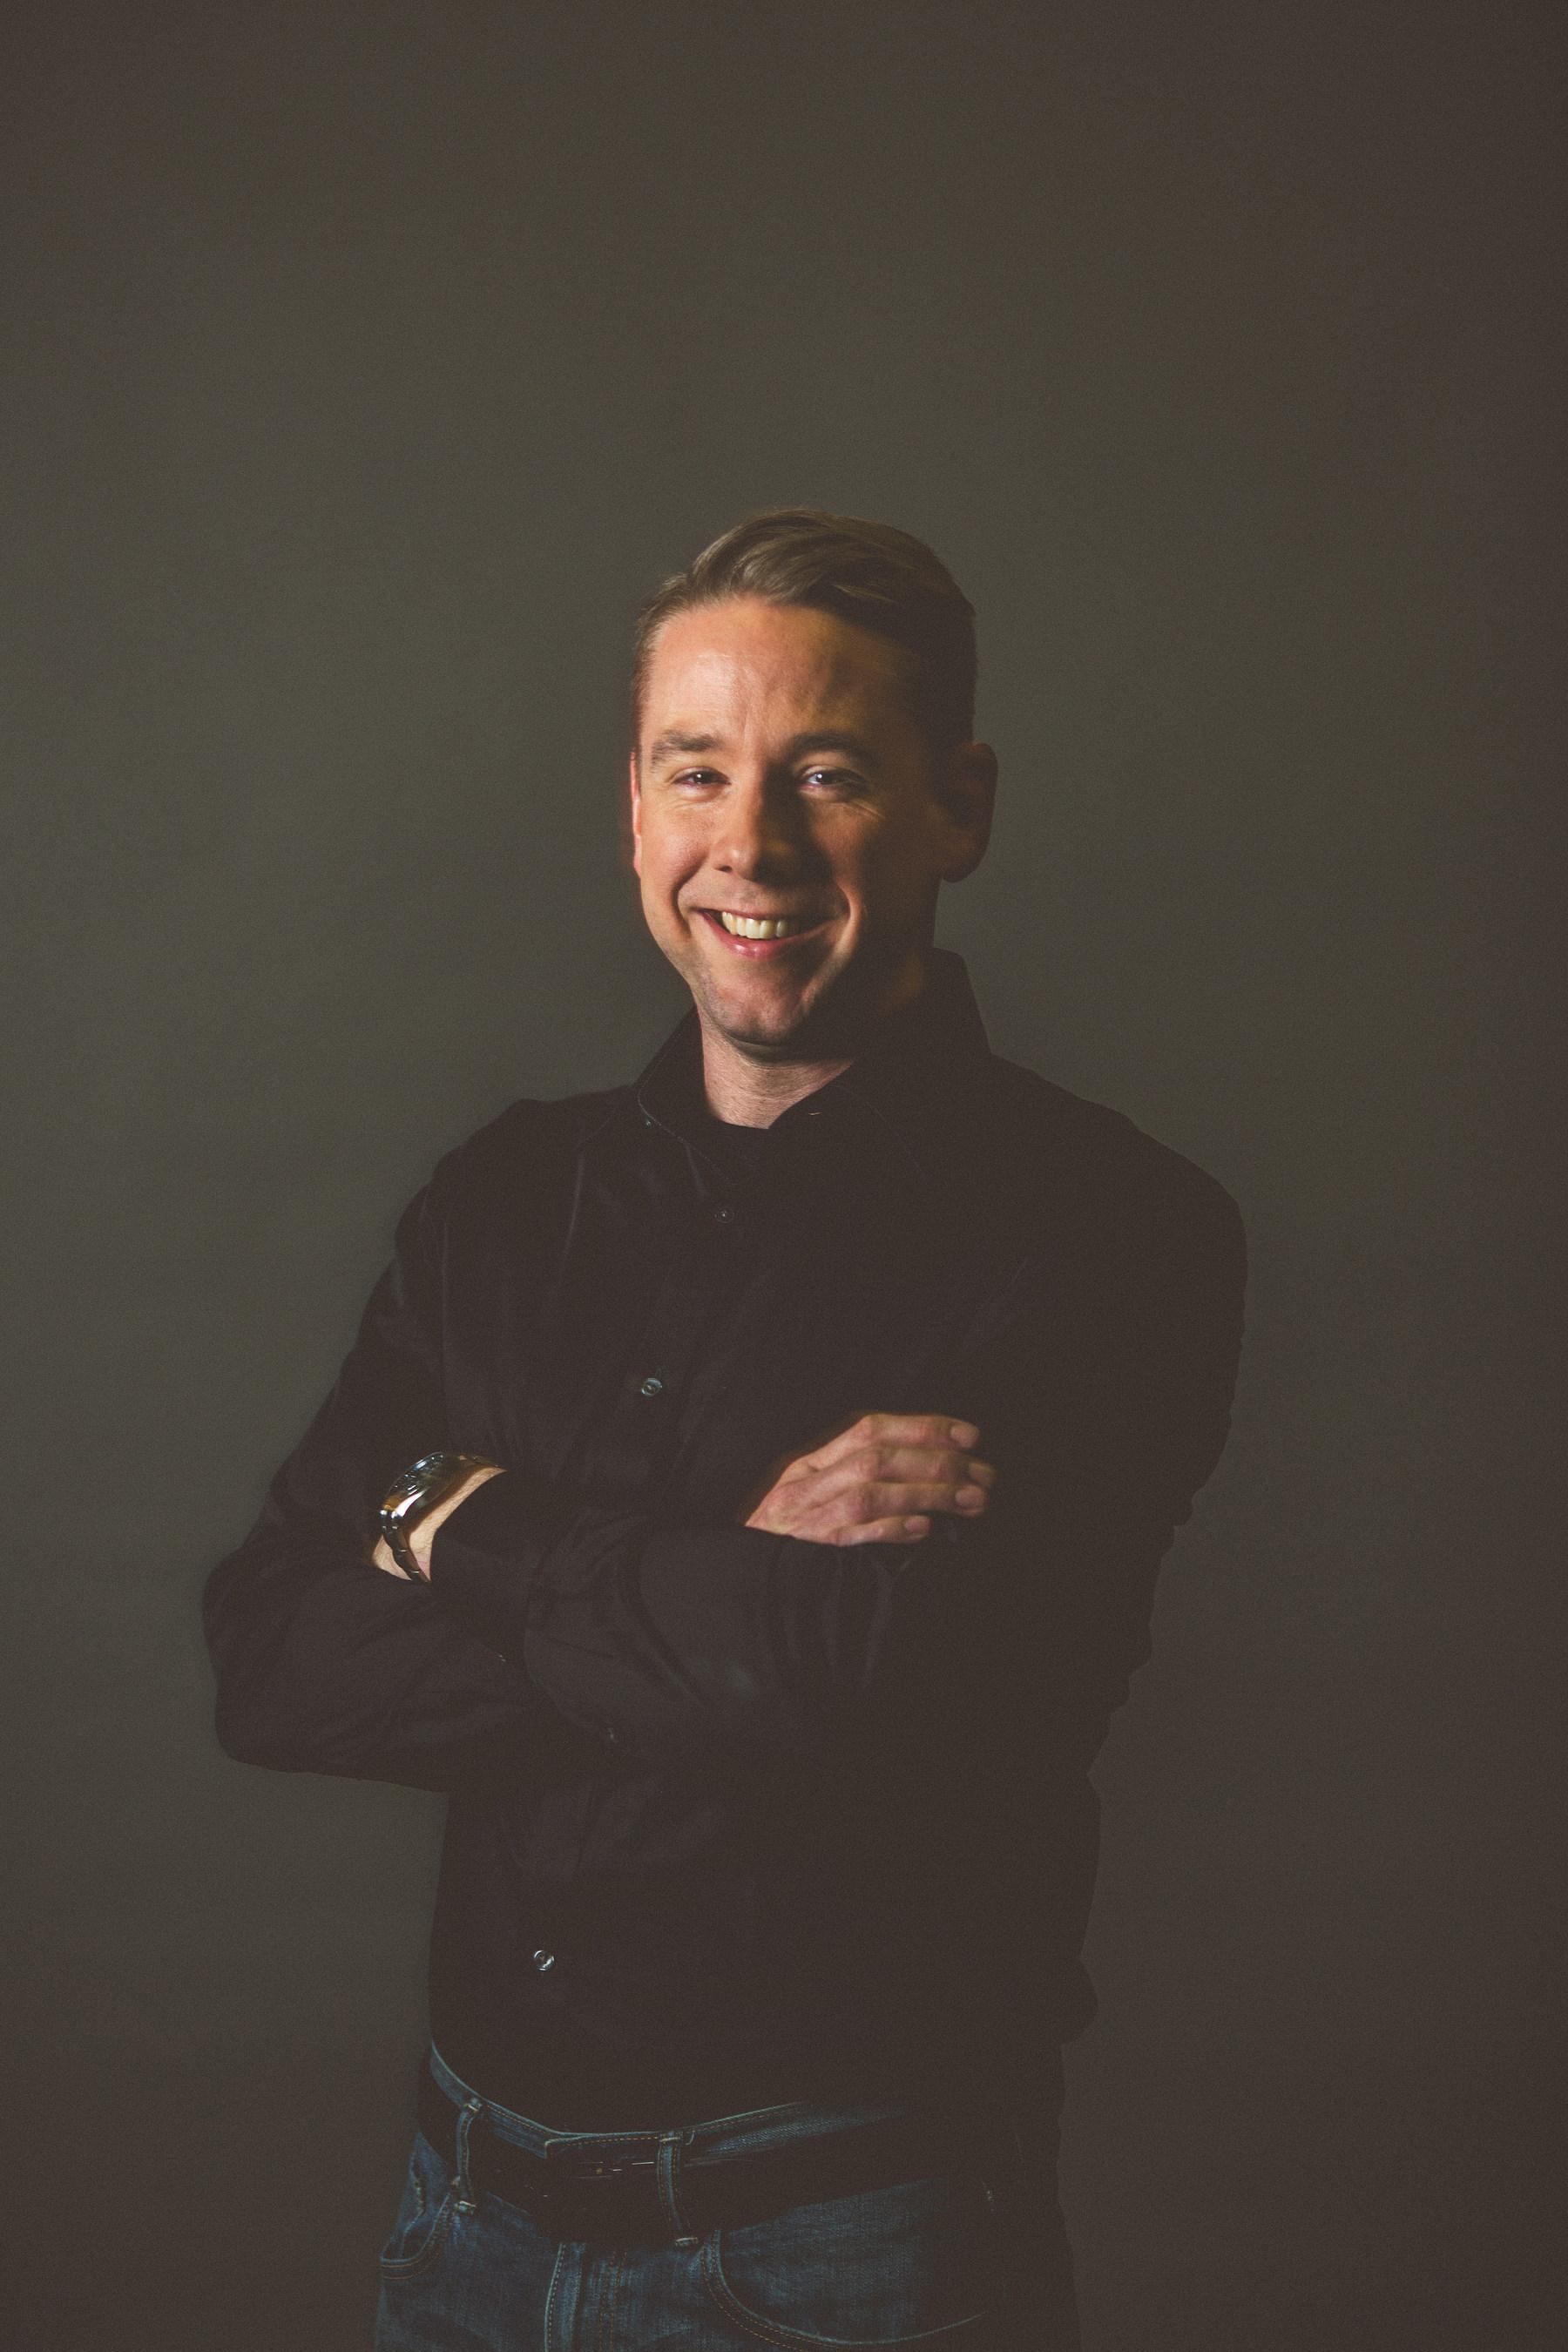 LEVEL Studios Strengthens Executive Leadership Team With Industry Veteran Michael Phillips